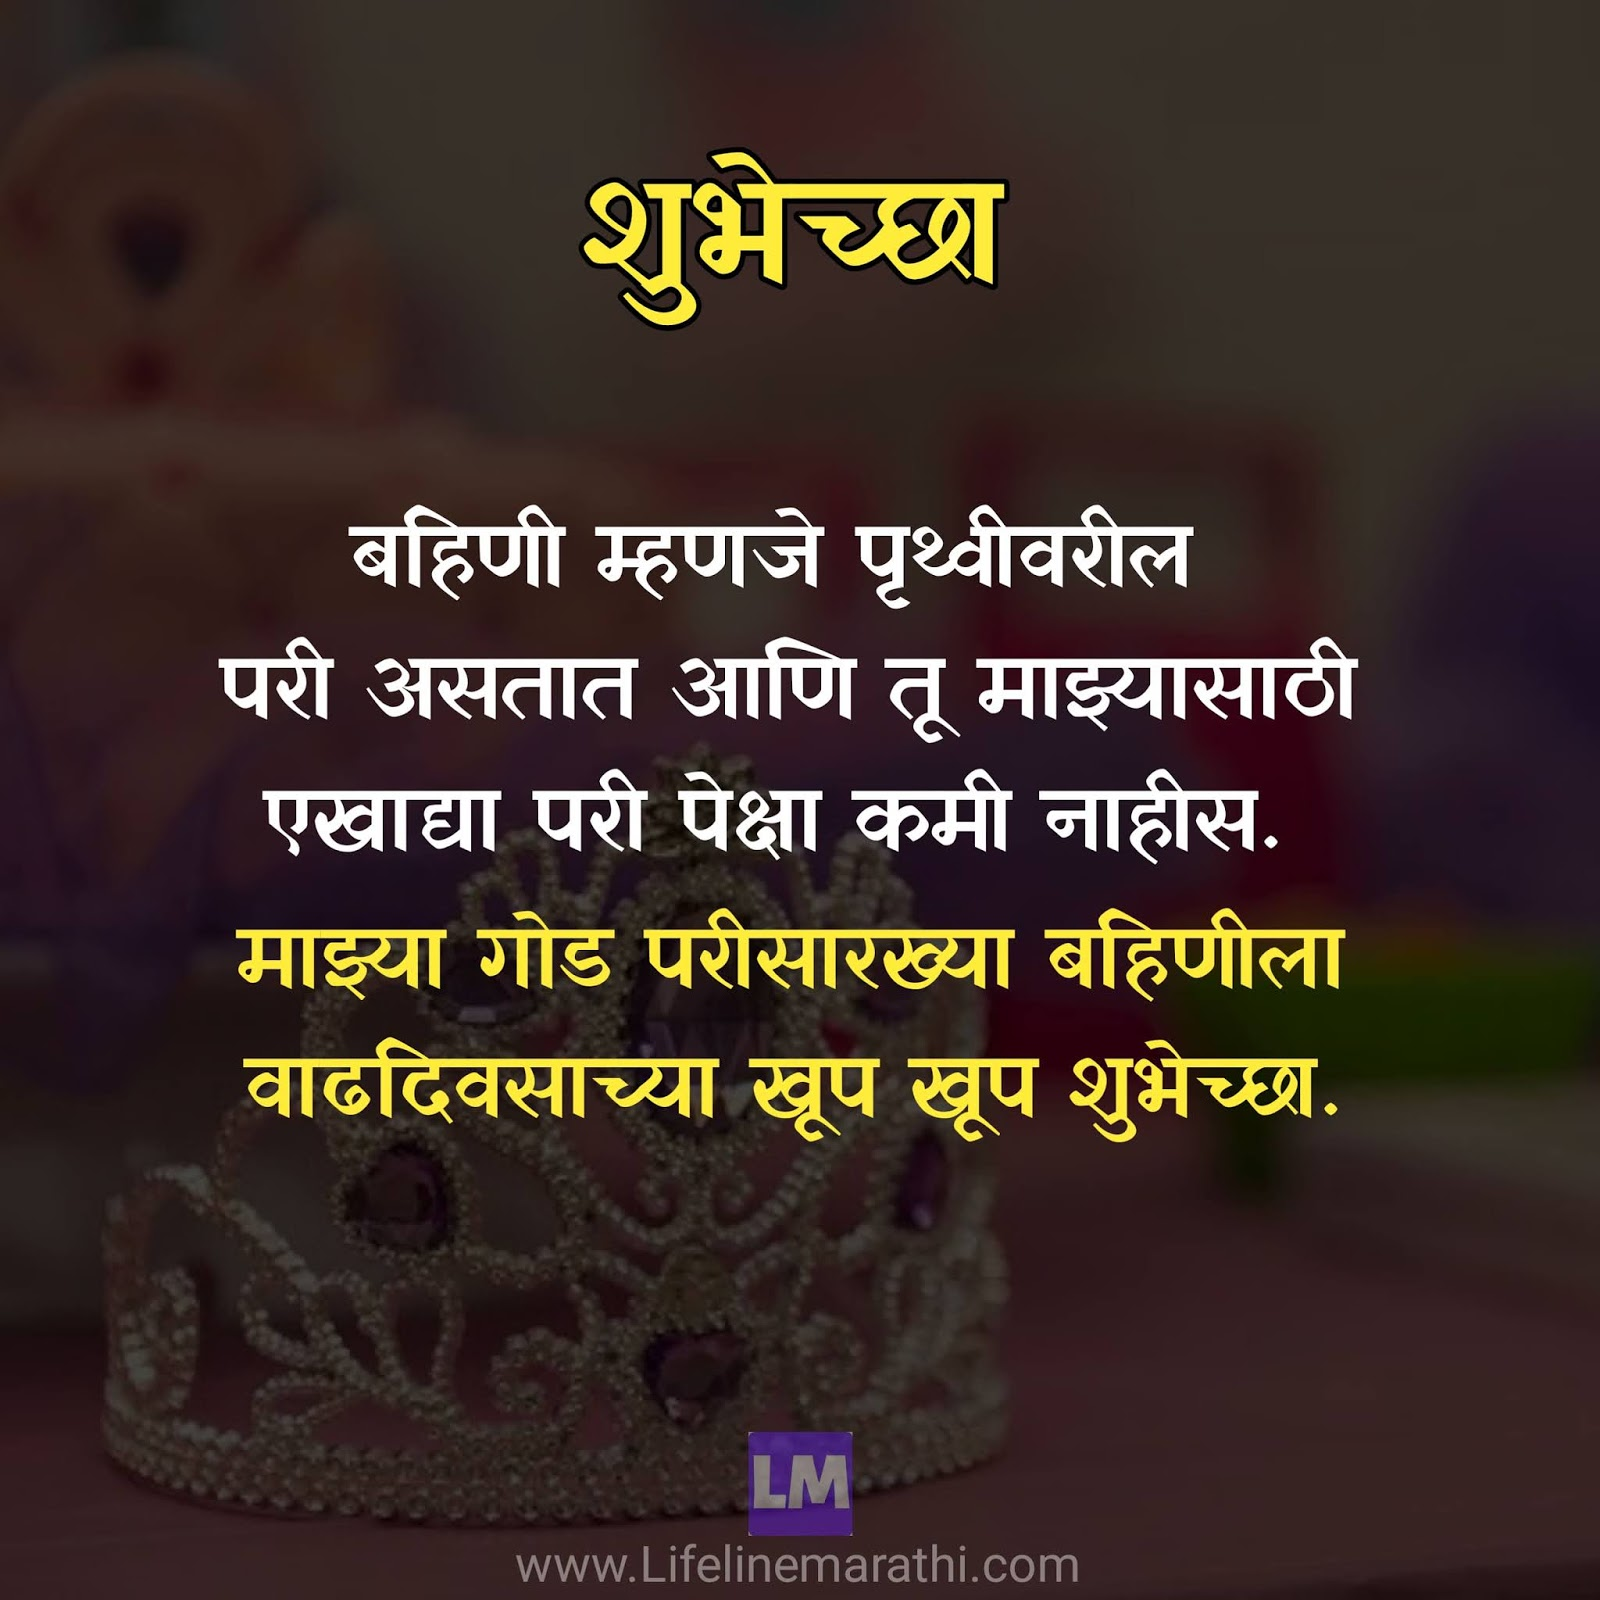 Áˆ Happy Birthday Wishes For Sister In Marathi À¤¬à¤¹ À¤£ À¤² À¤µ À¤¢à¤¦ À¤µà¤¸ À¤š À¤¯ À¤¶ À¤ À¤š À¤›